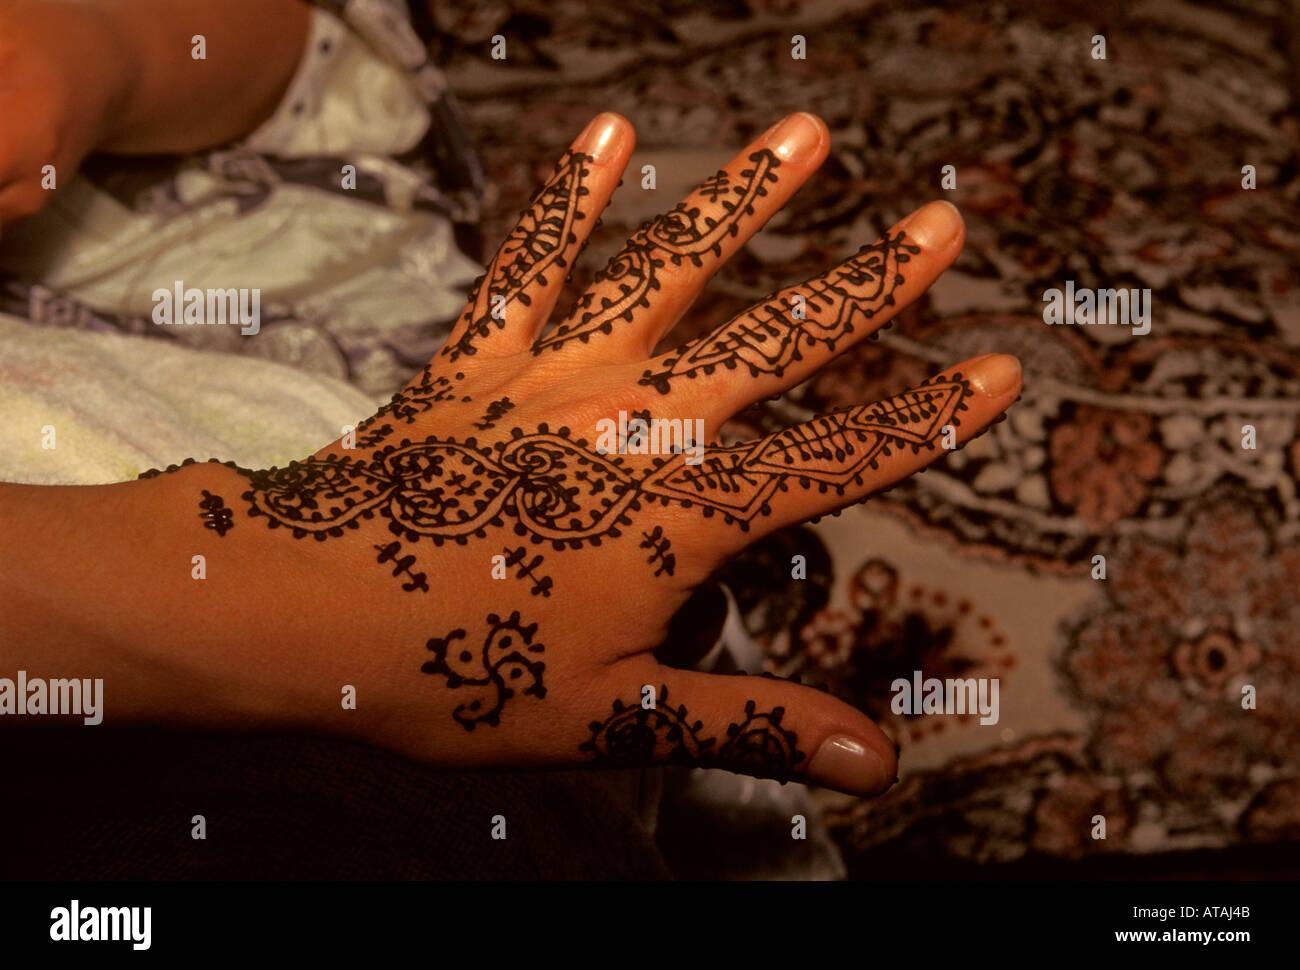 Henna tattoo henna tattoo tattoos tatooing hand skin for Henna tattoos locations